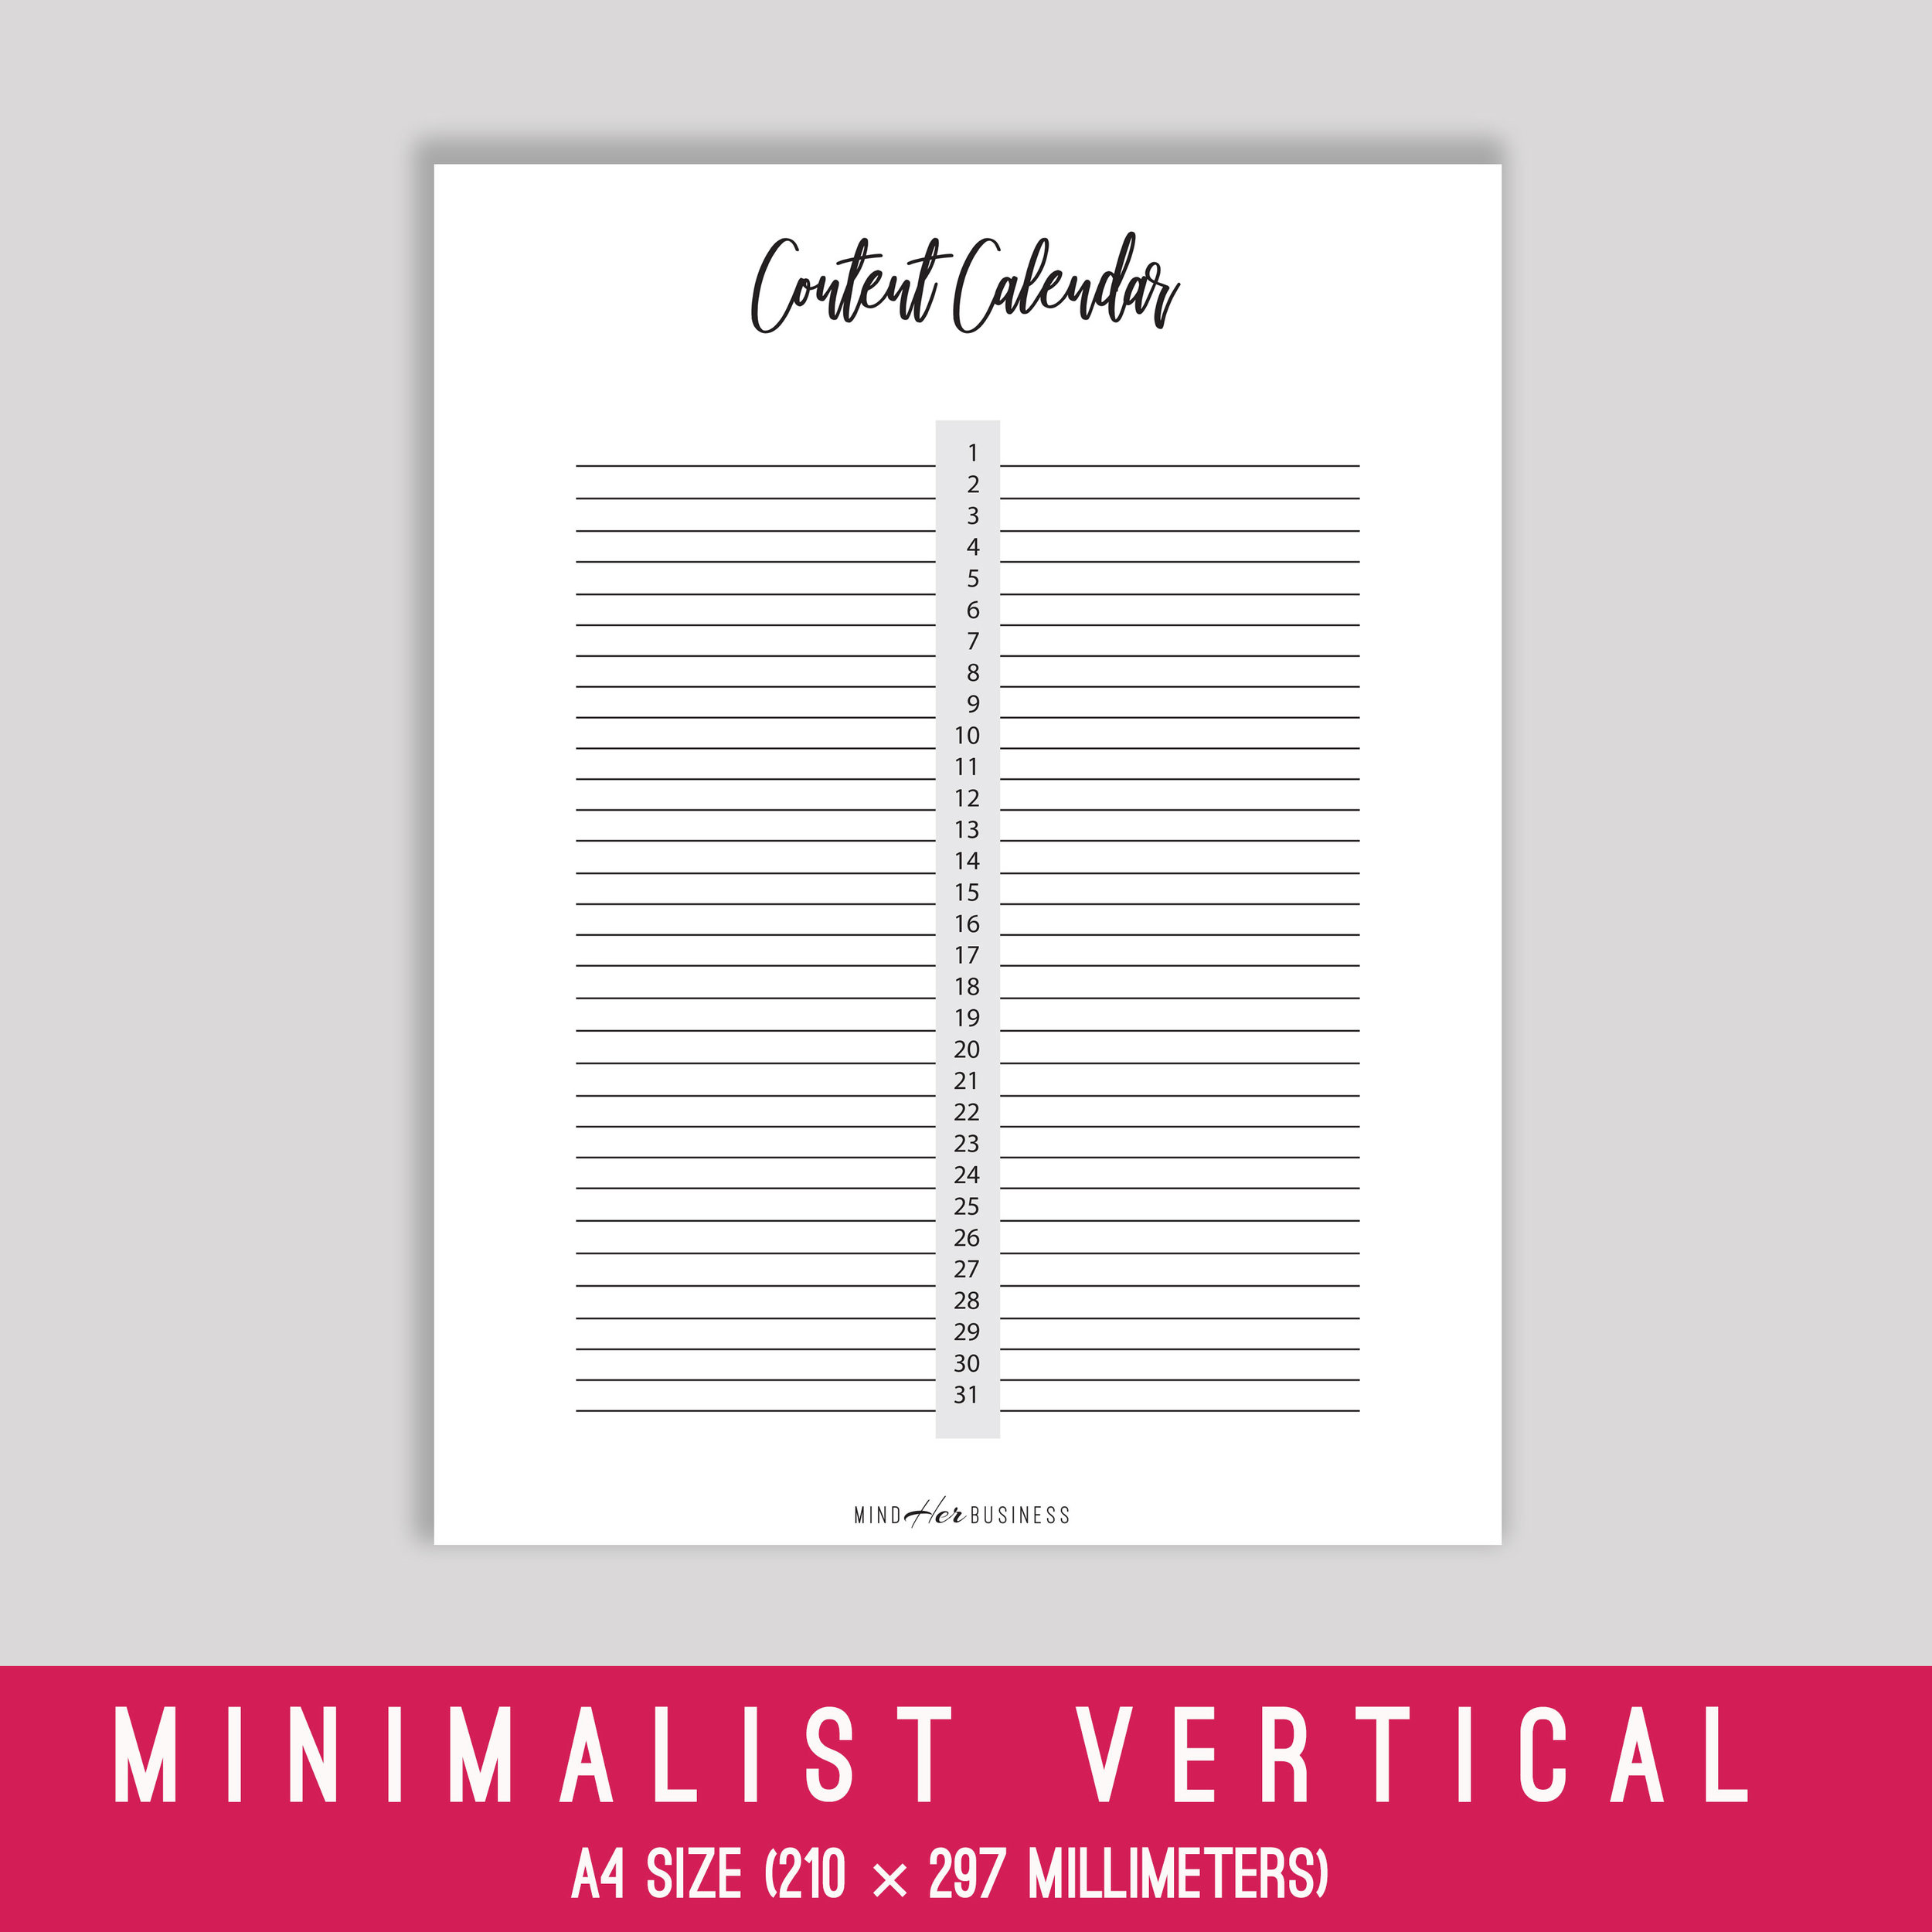 mhb-calendar-mockup-minimalist-a4.jpg